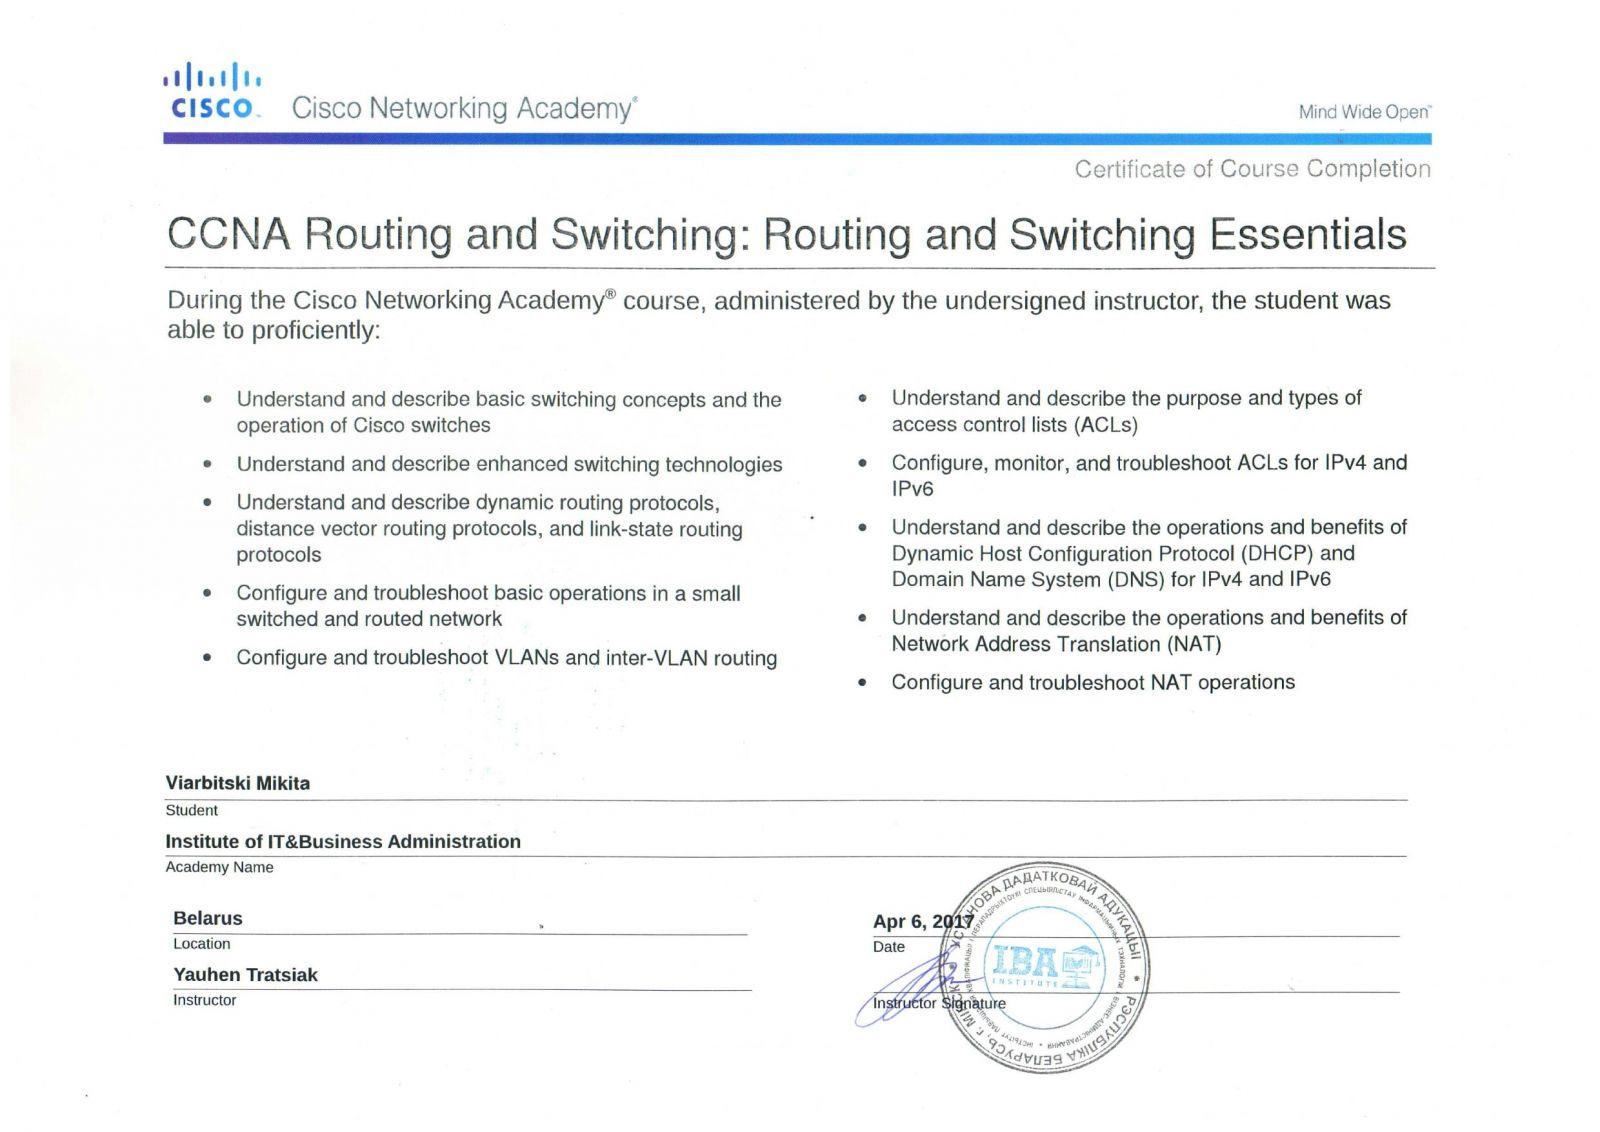 Сертификаты квалификации Cisco 2